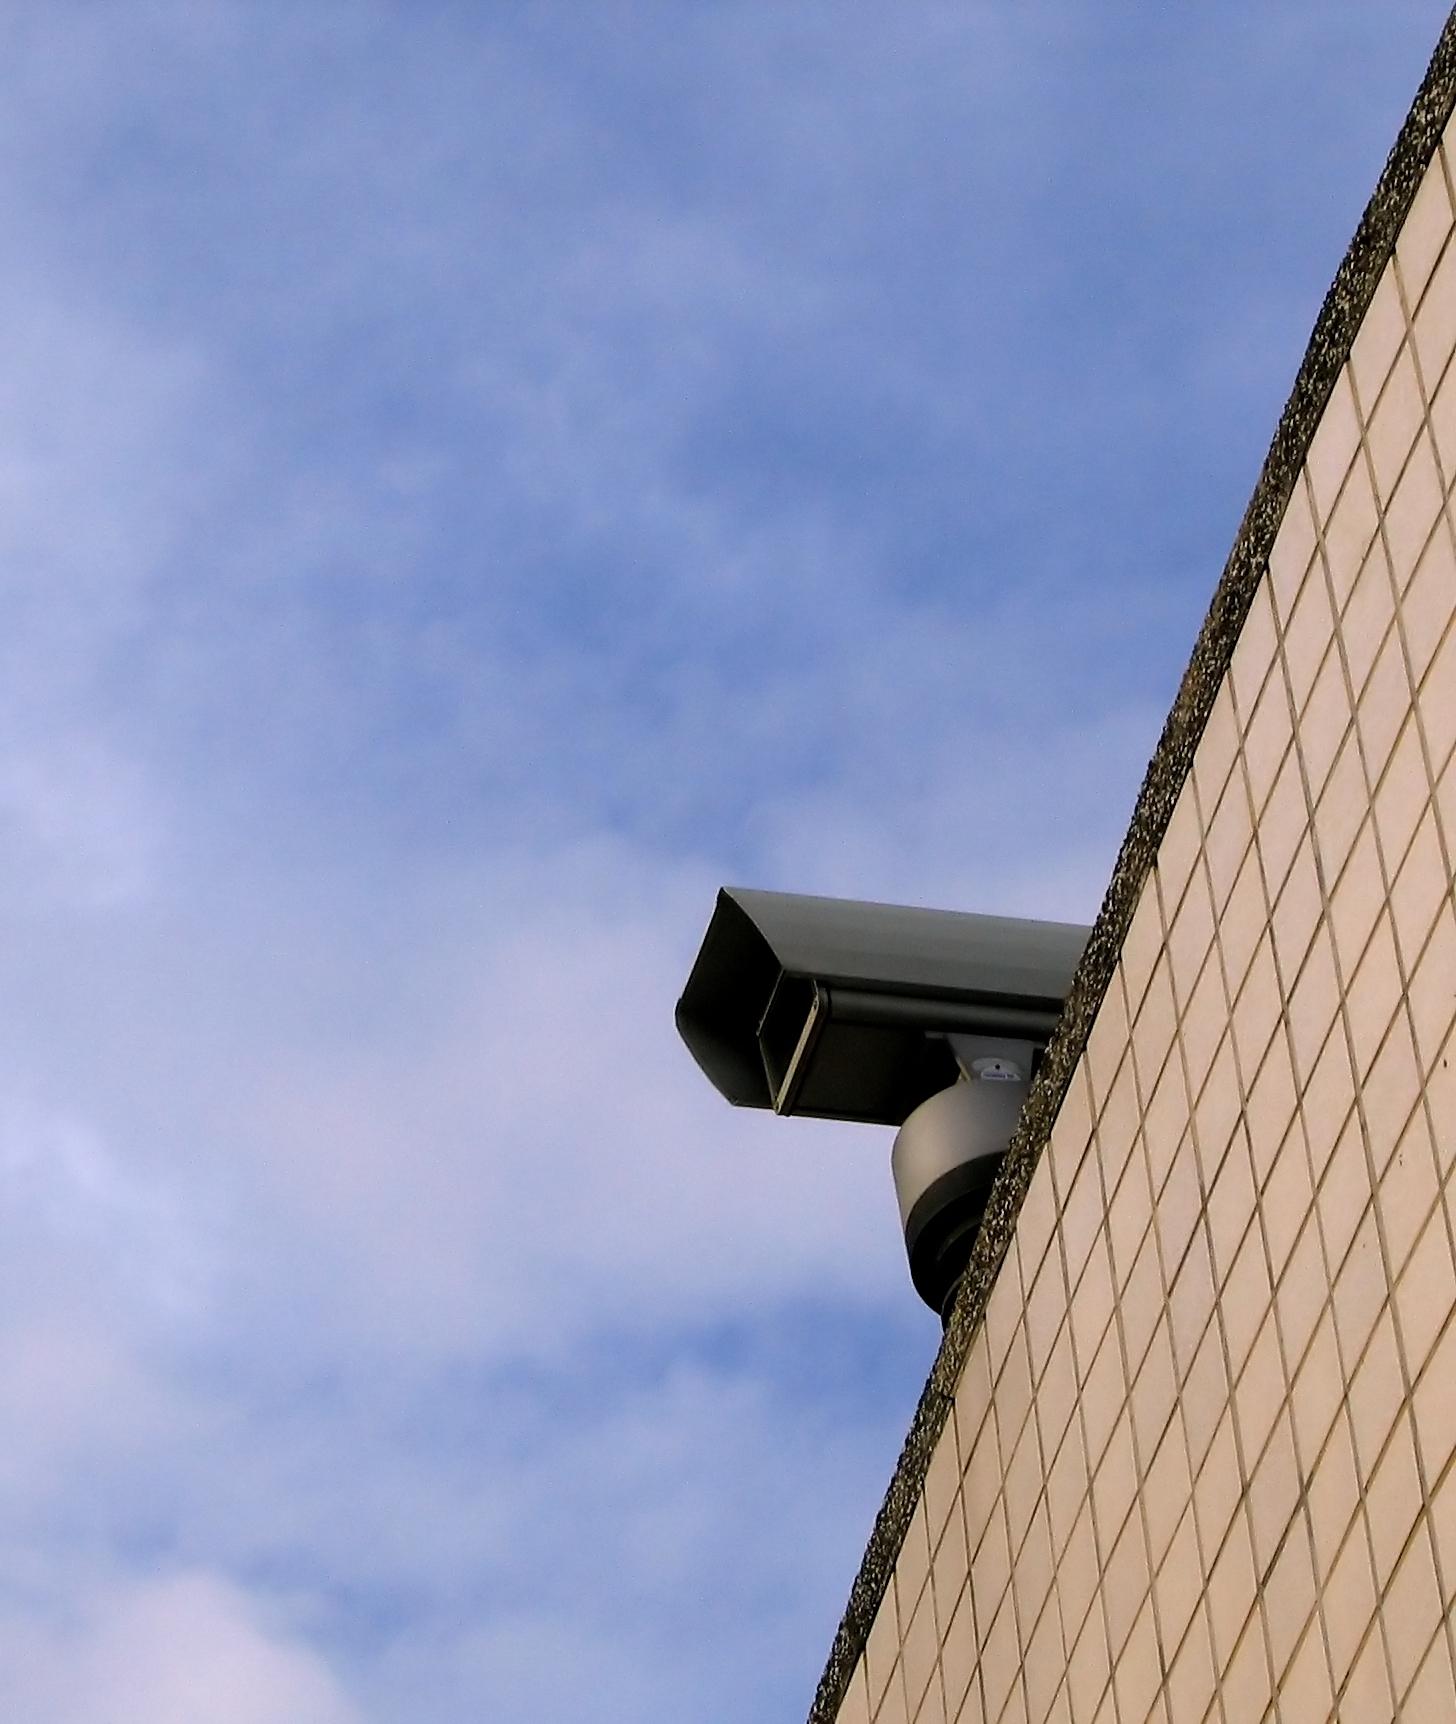 Security Camera, Bricks, Camera, Device, Electronics, HQ Photo